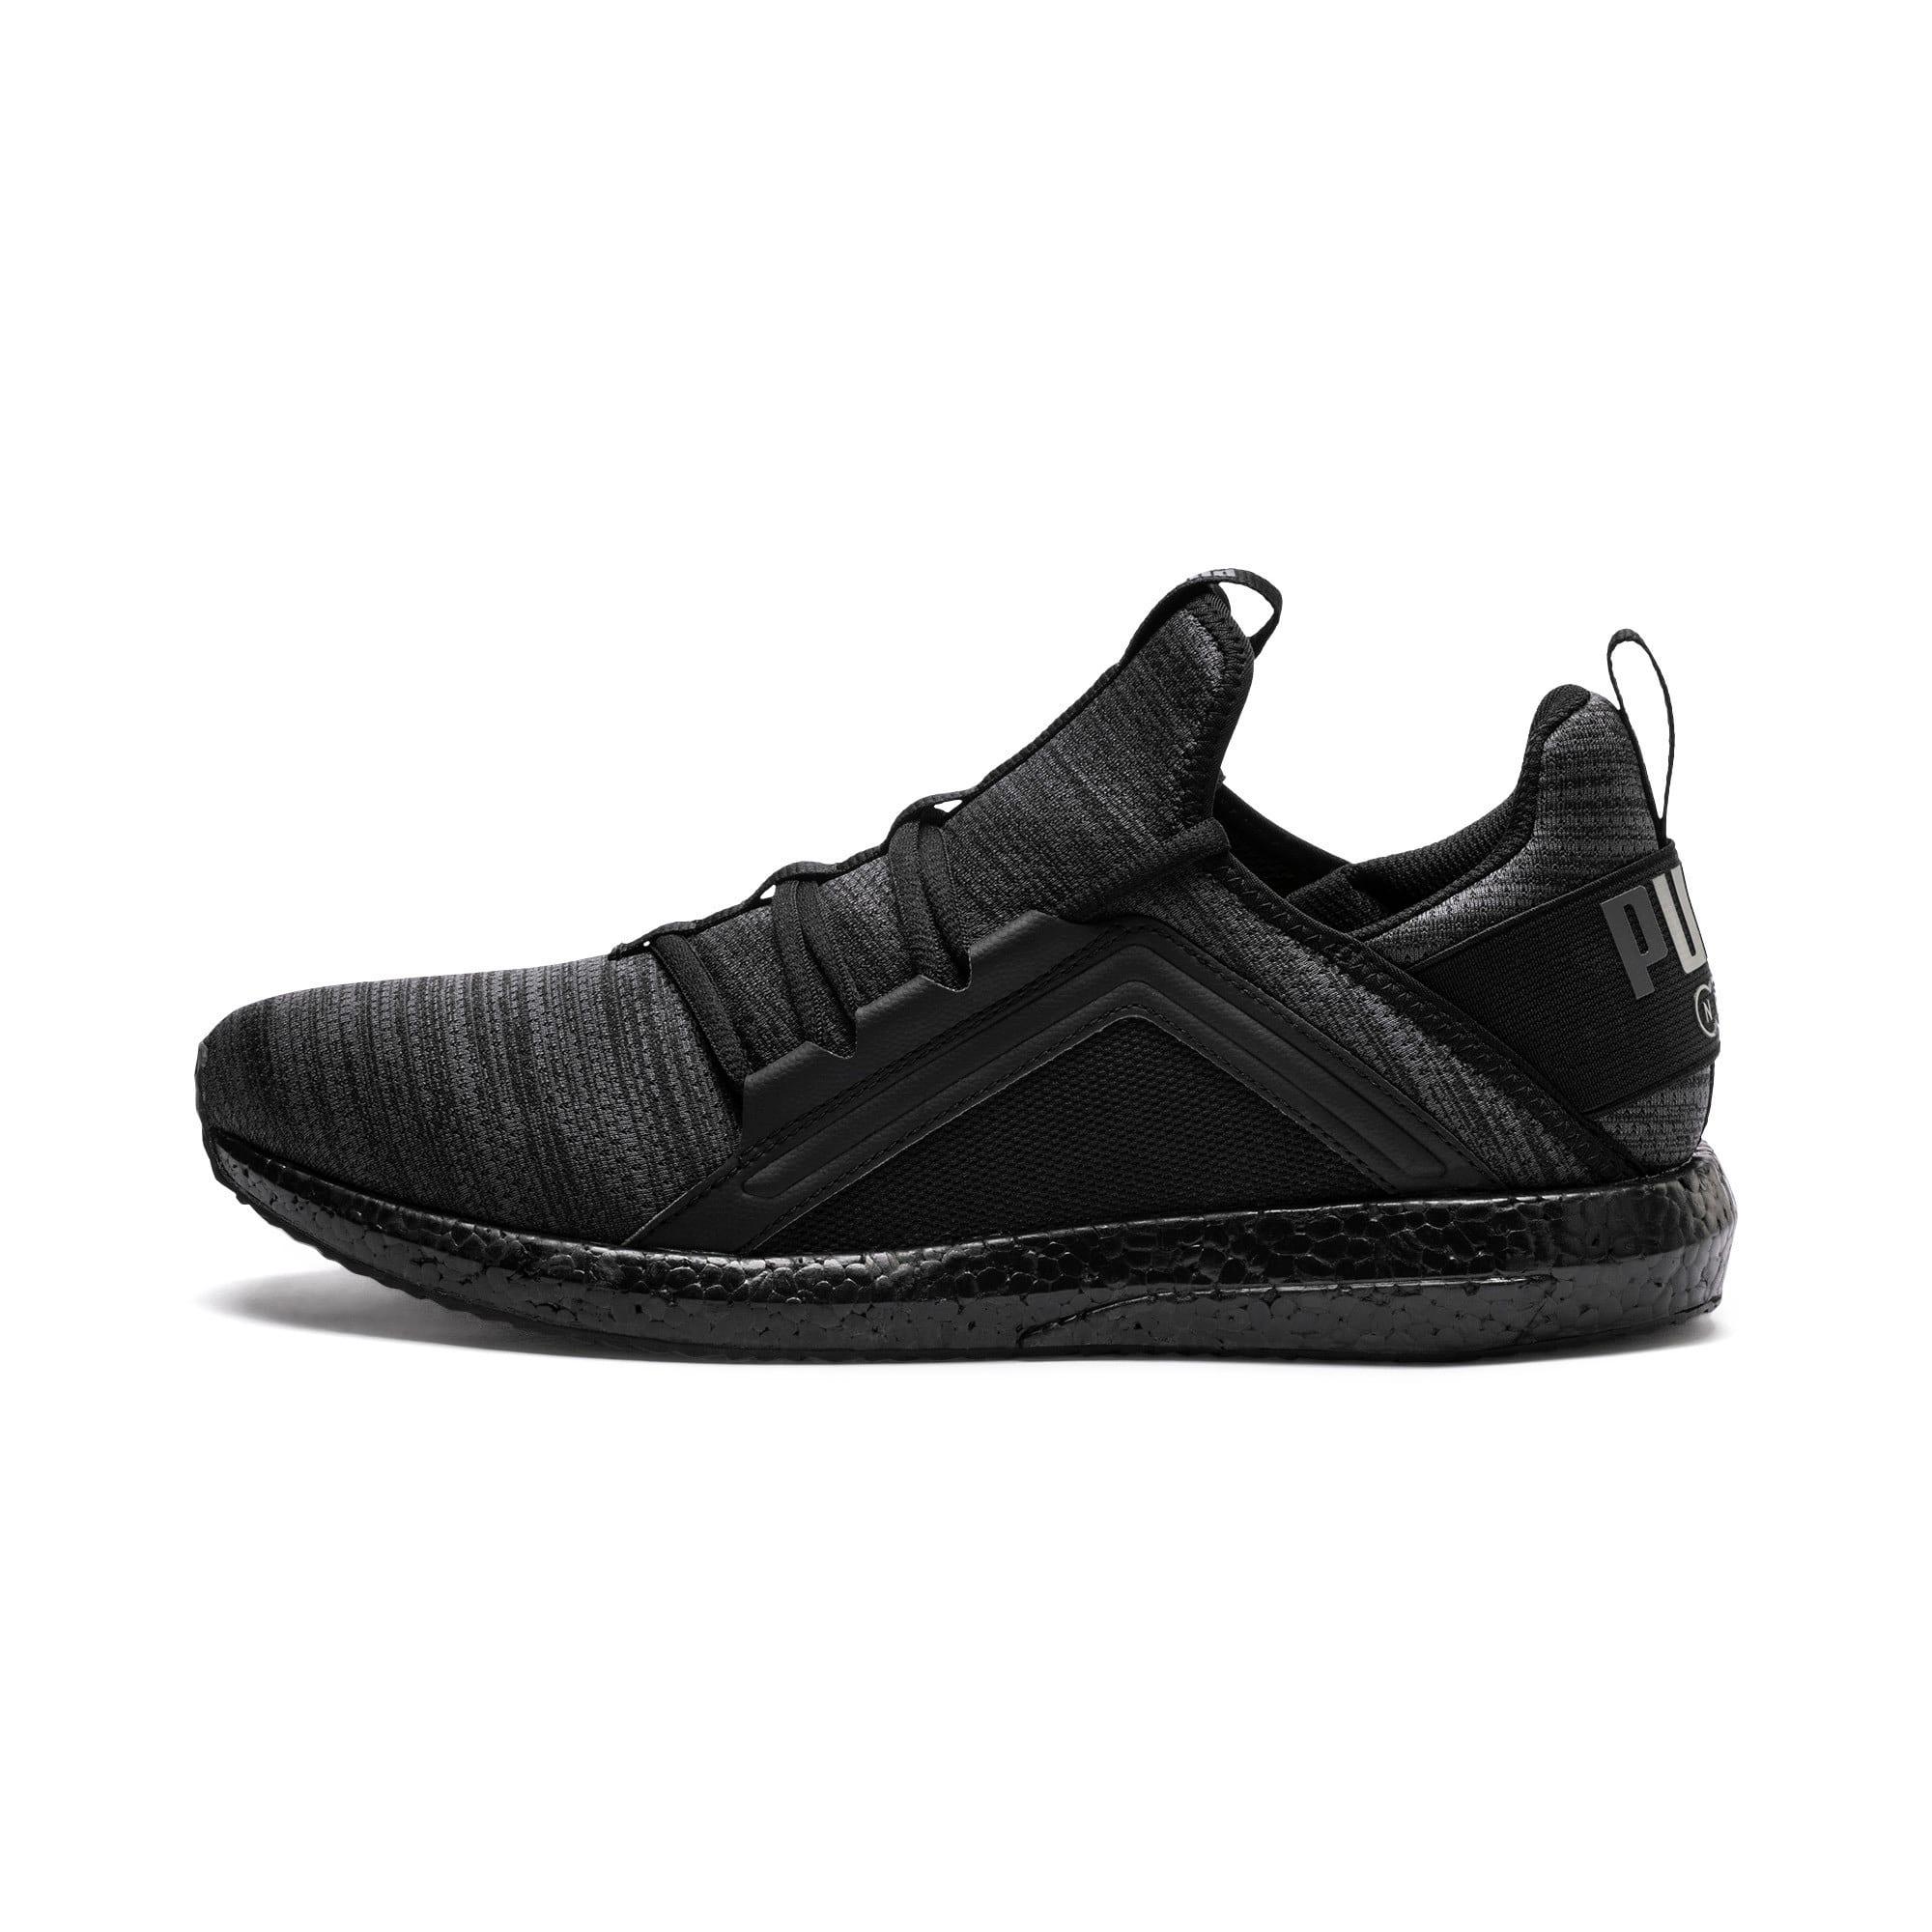 Thumbnail 1 of Mega NRGY Heather Knit Men's Running Shoes, Iron Gate-Puma Black, medium